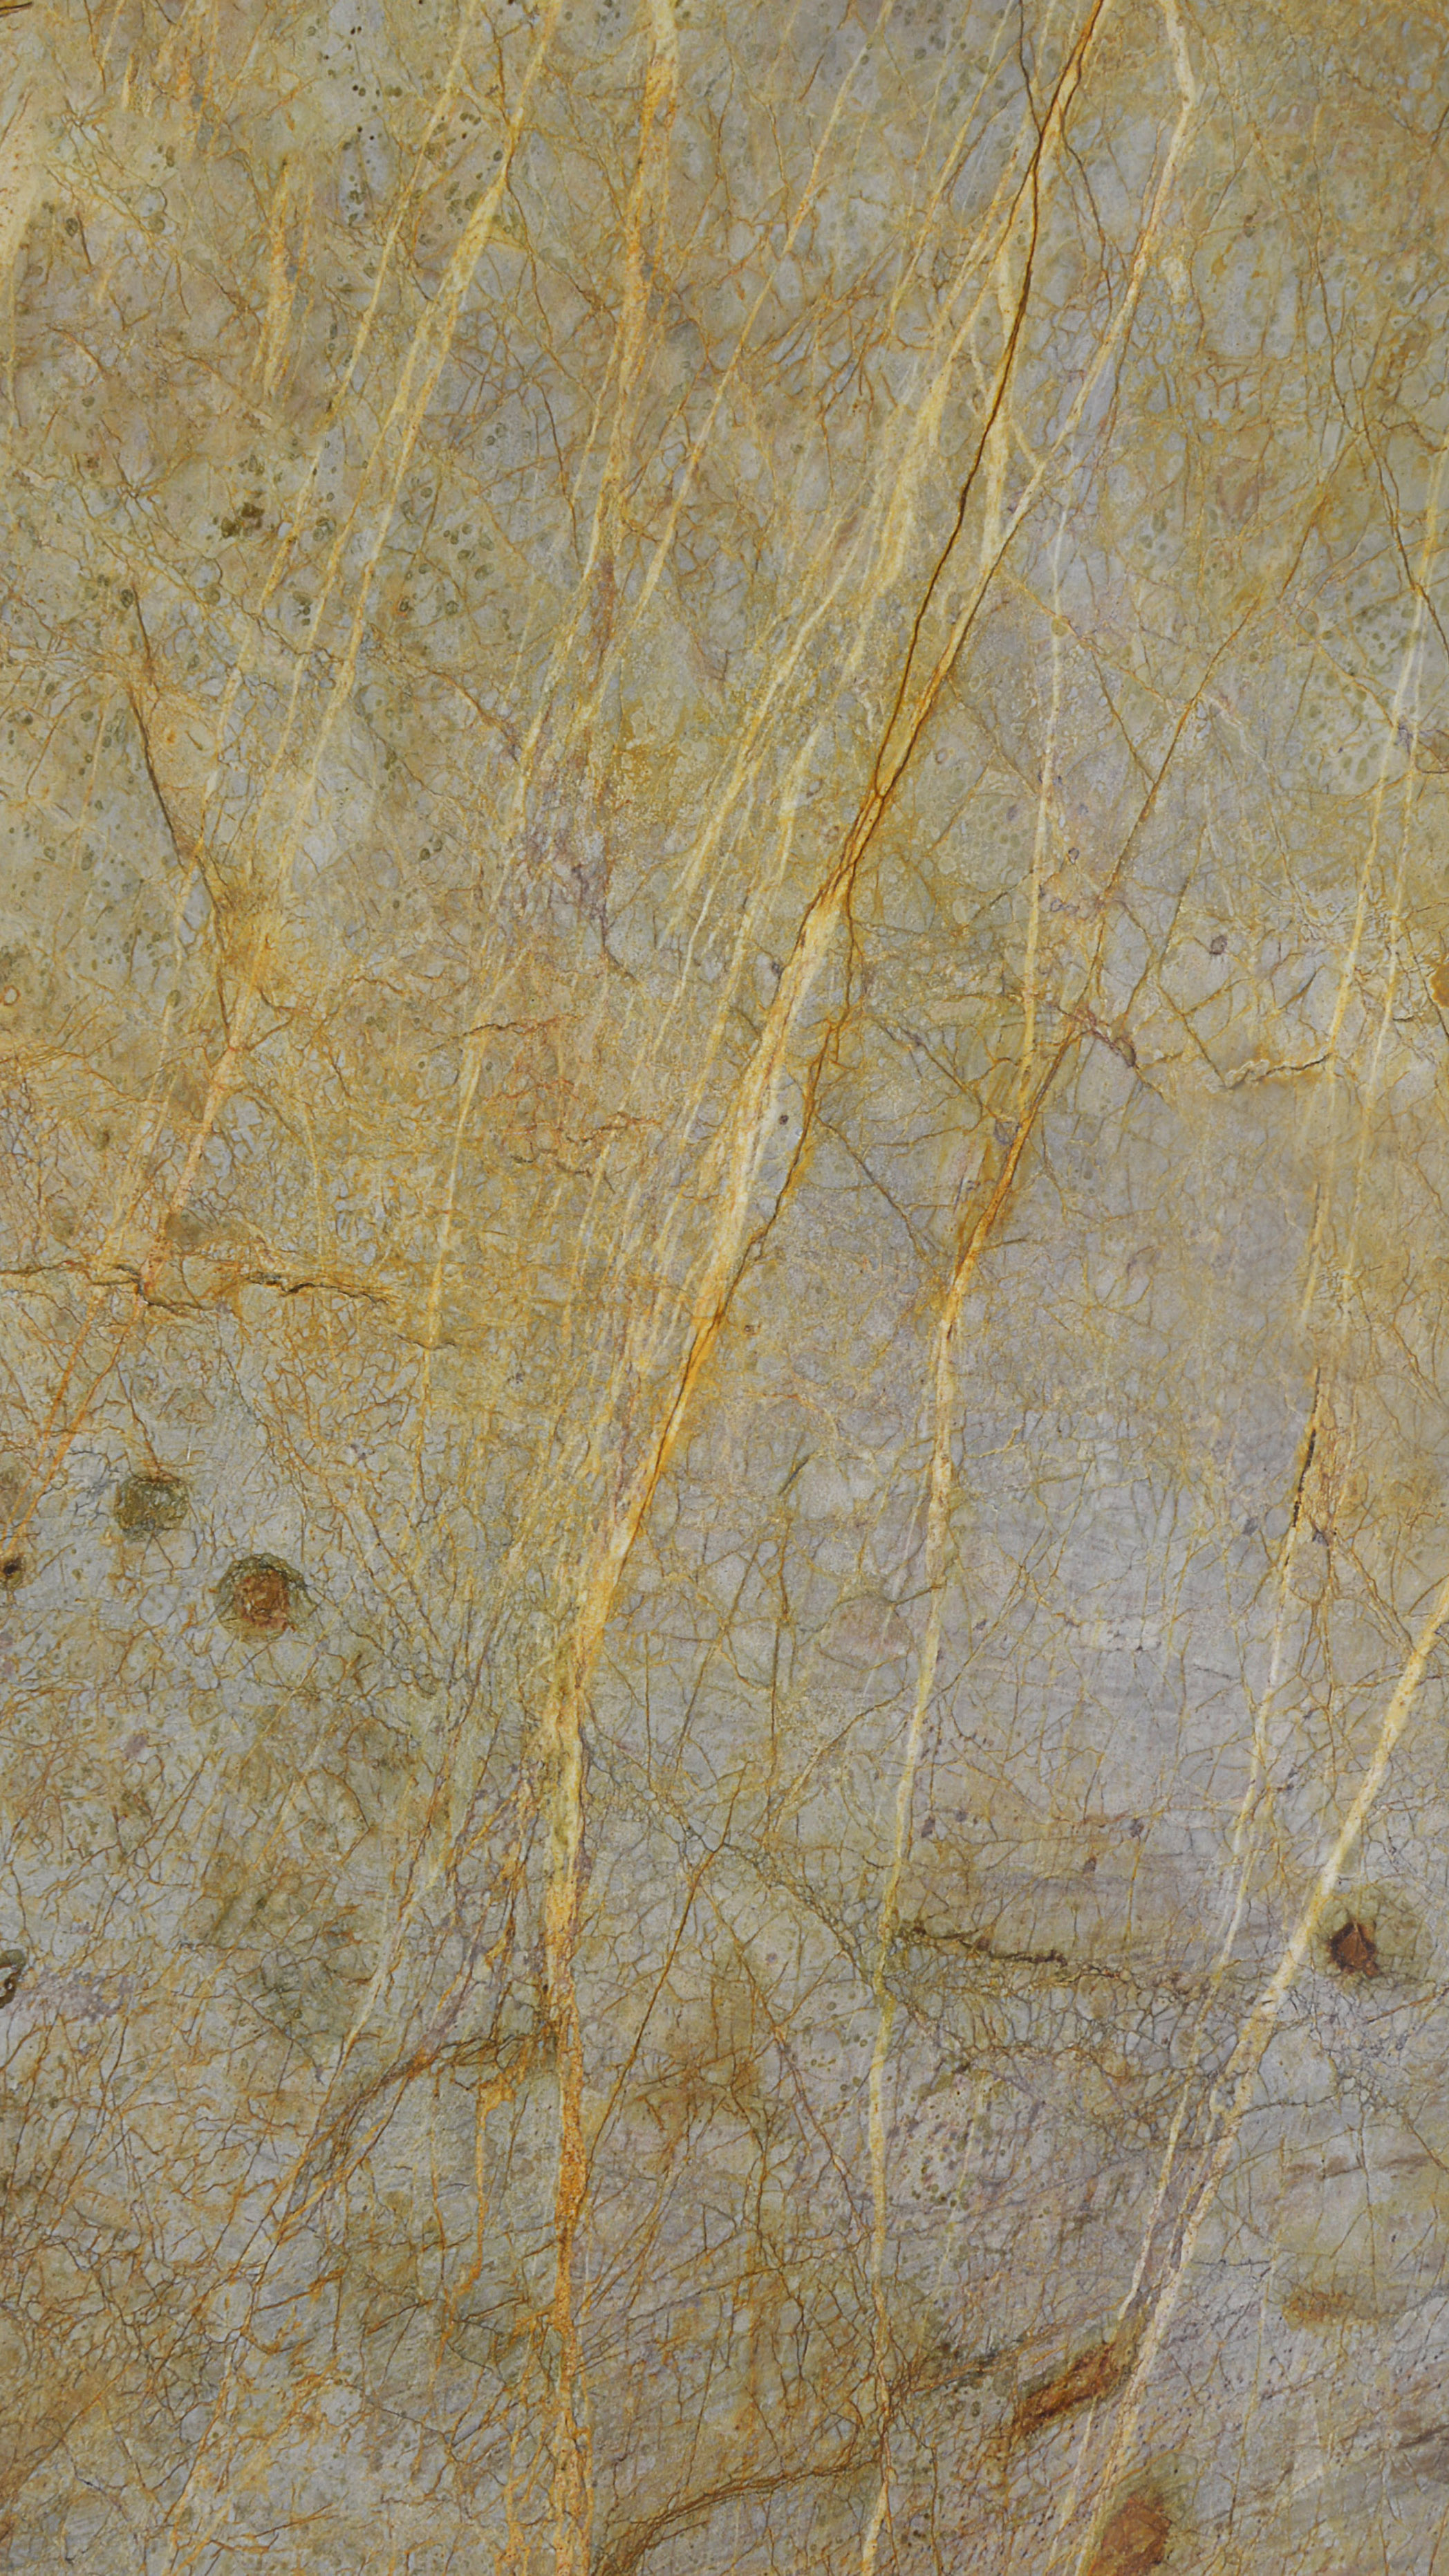 New Golden Zieler Quartzite